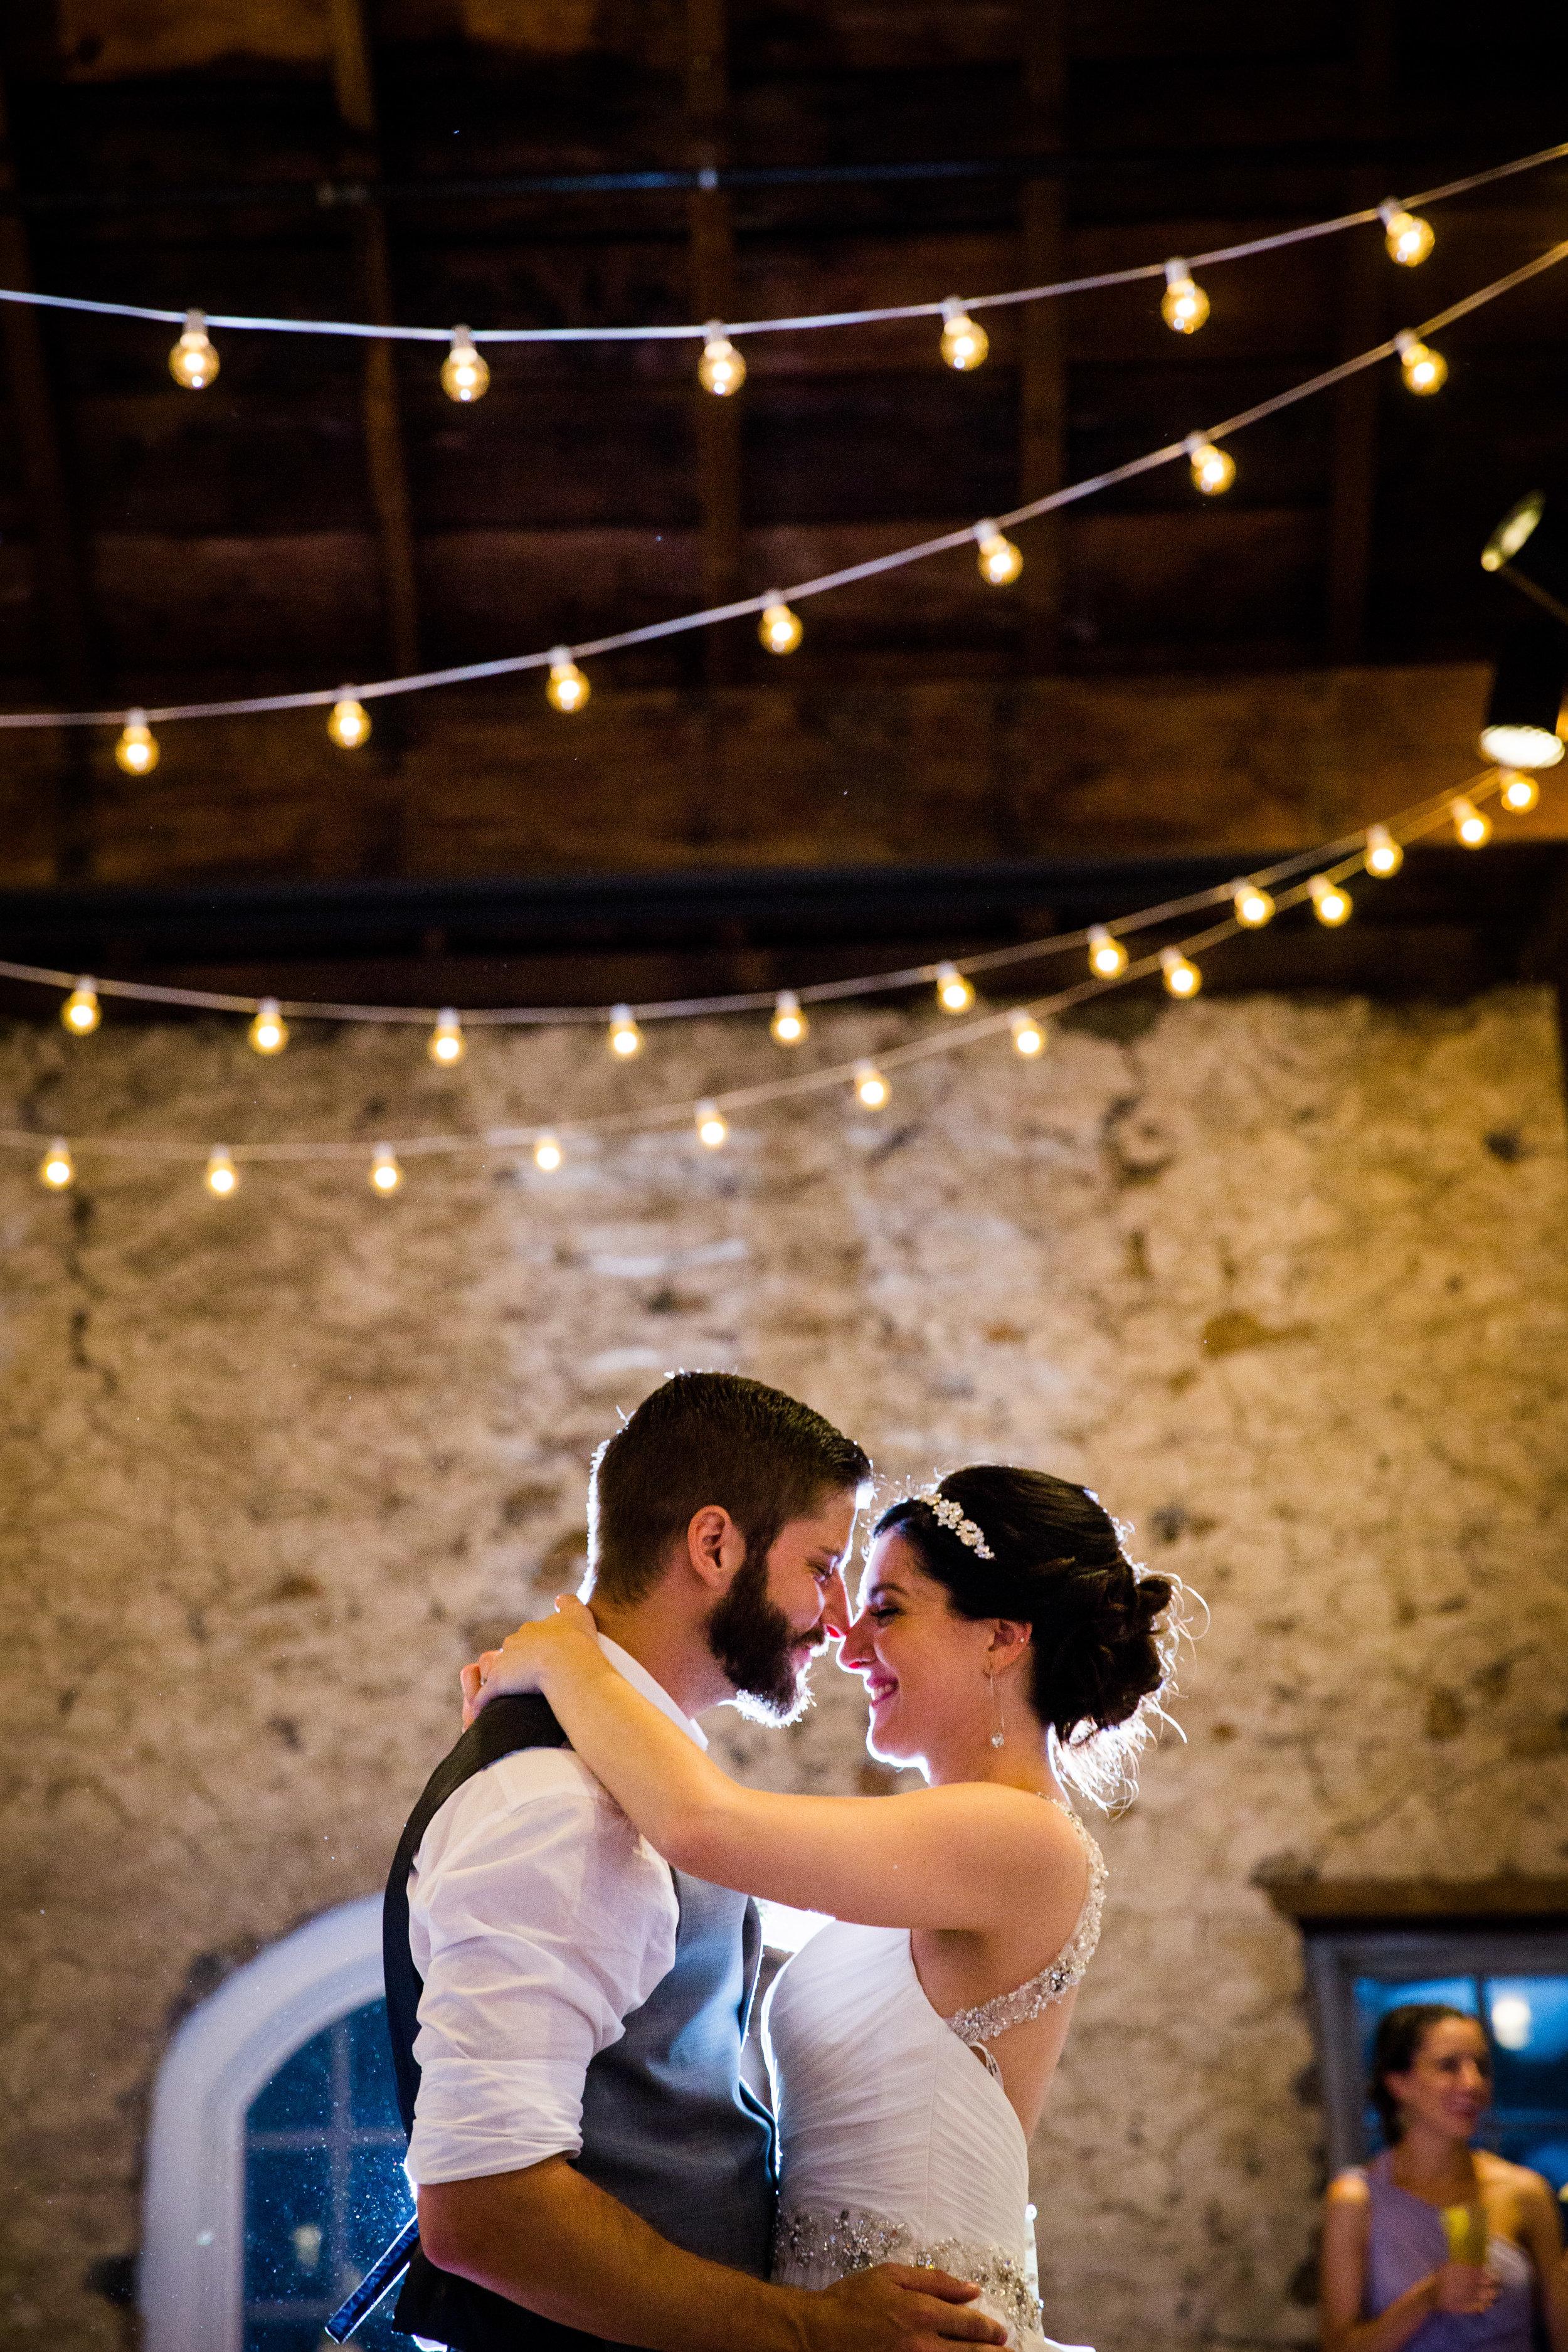 TYLER ARBORETUM WEDDING PHOTOGRAPHY LOVESTRUCK PICTURES-082.jpg